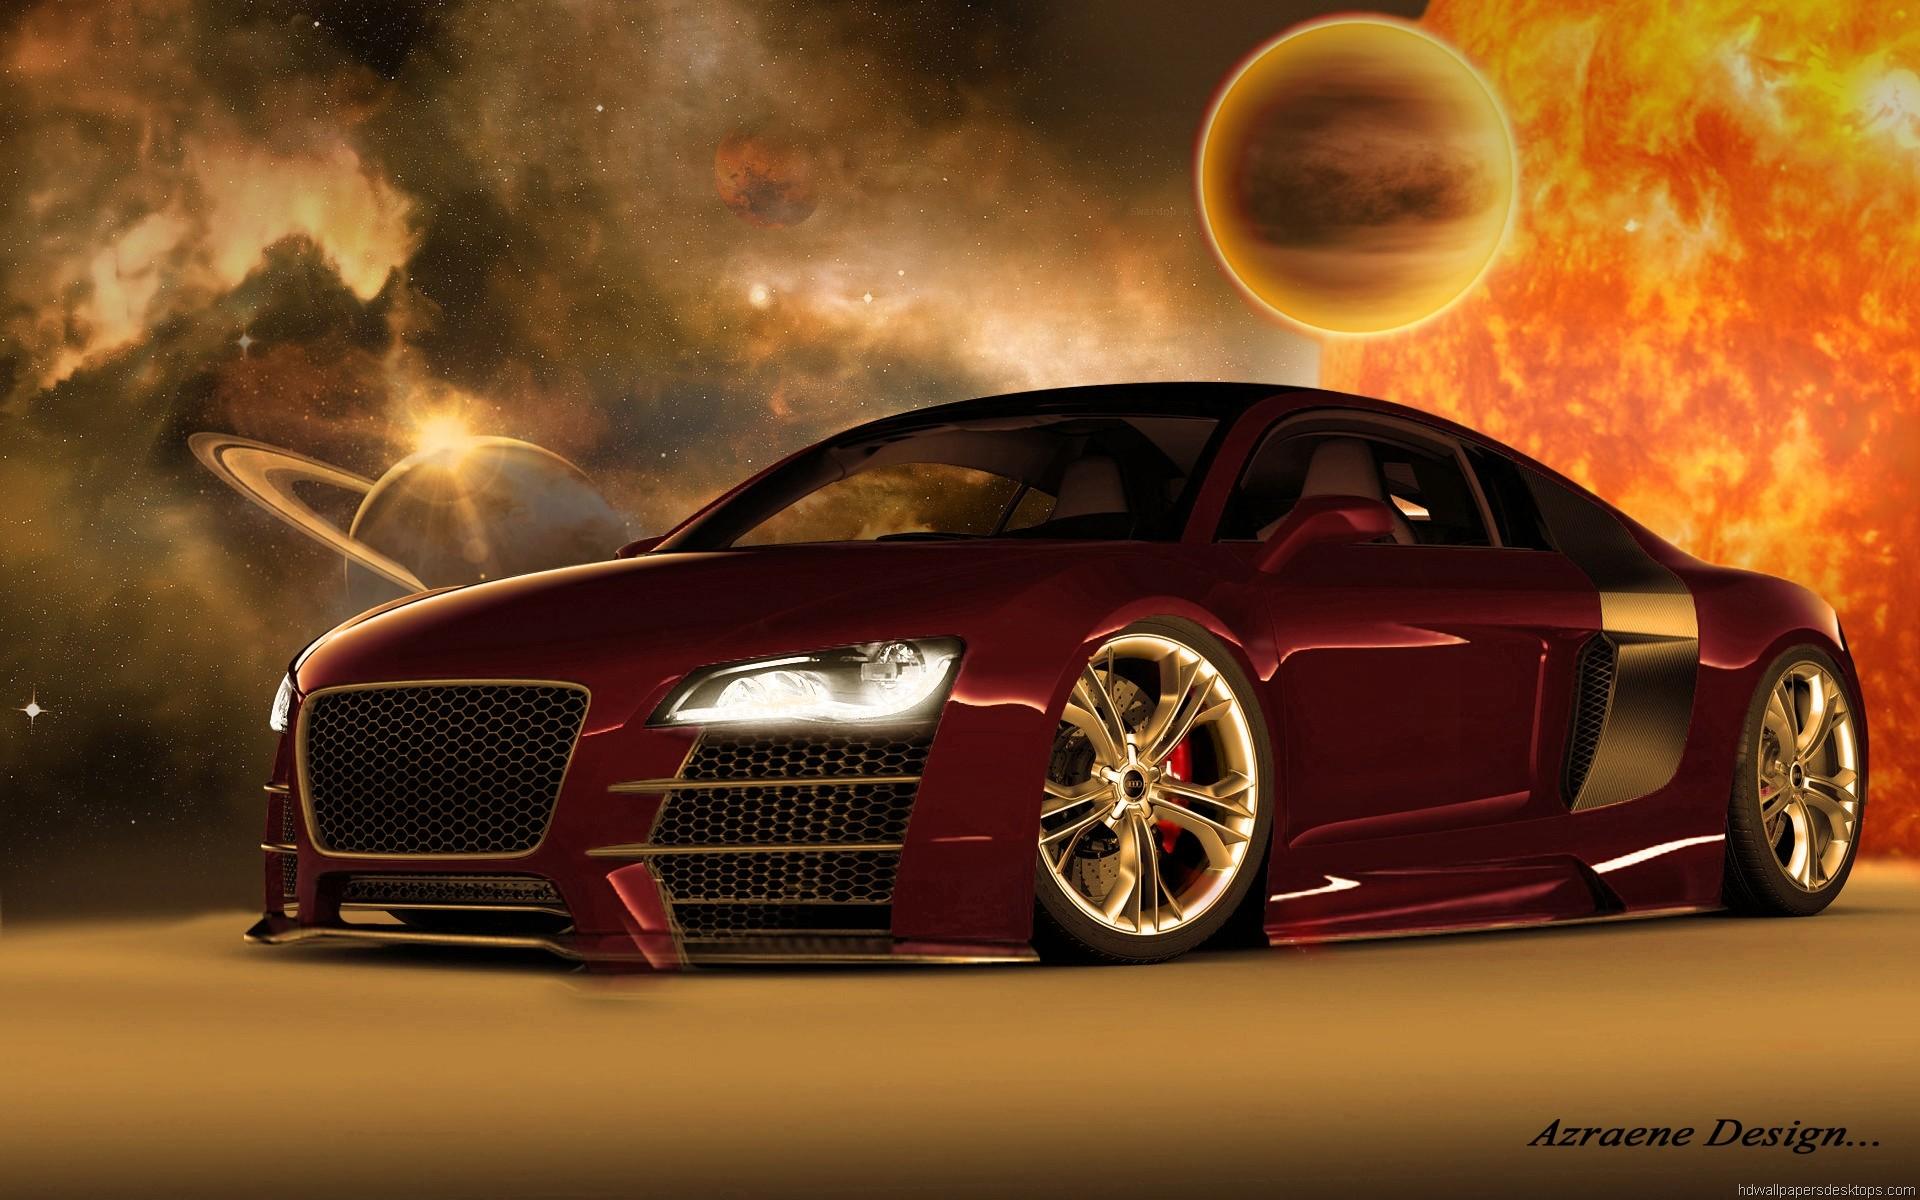 cars wallpapers hd full hd 1080p desktop backgrounds 1920×1200